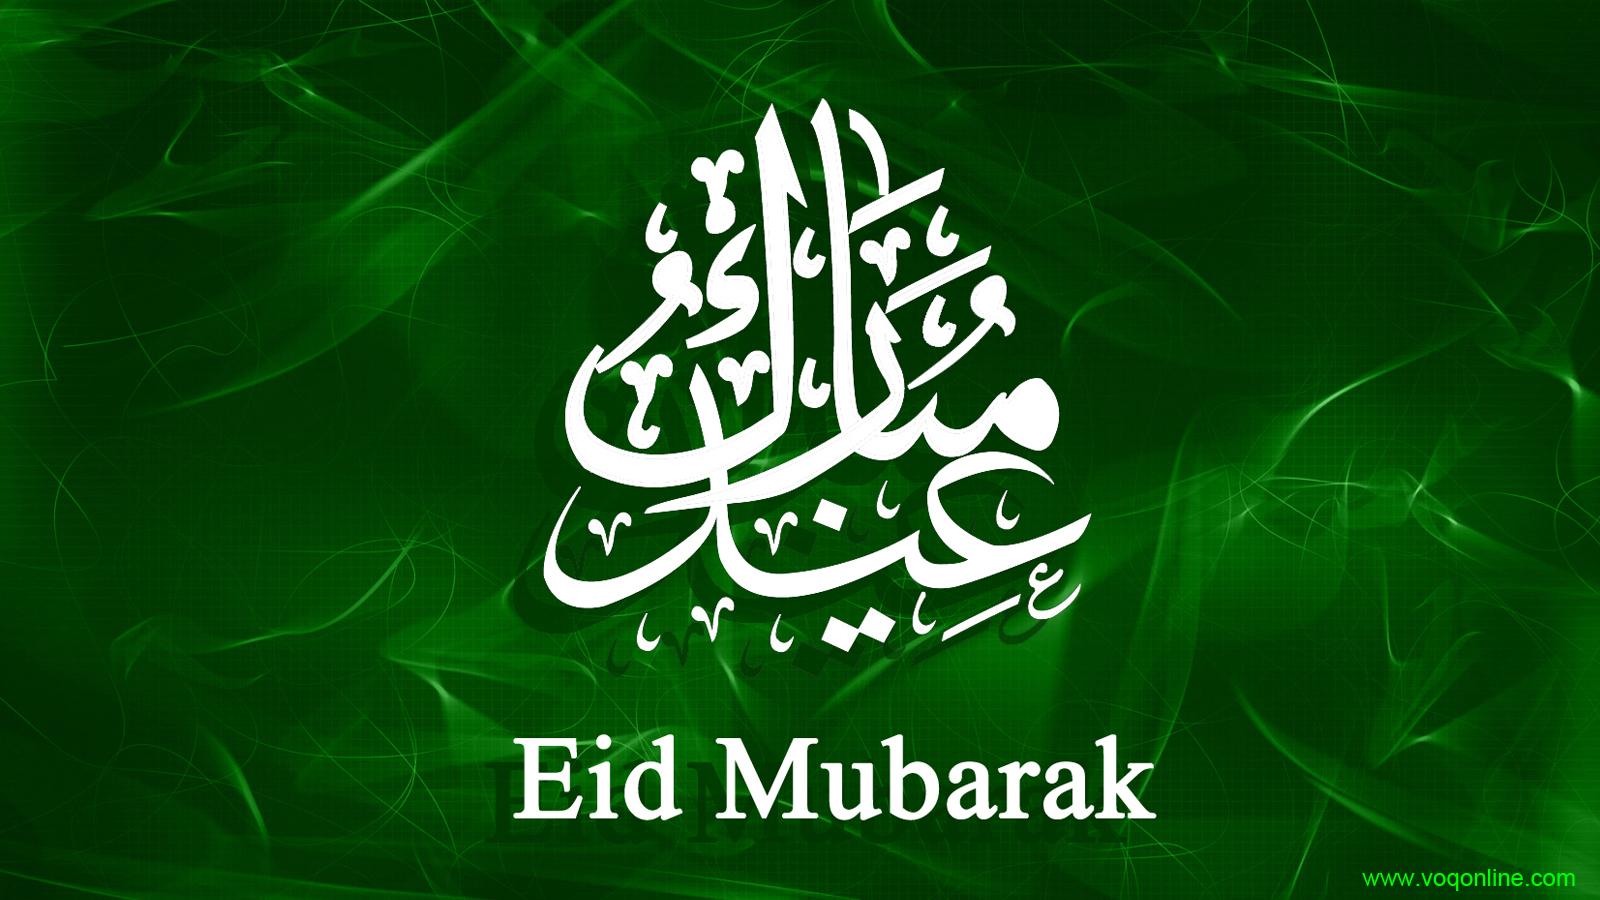 Eid mubarak wallpapers 2017 top wallpapers of eid eid mubarak eid 2017 wallpapers ramadan mubarak wallpapers latest ramzan eid images kristyandbryce Choice Image